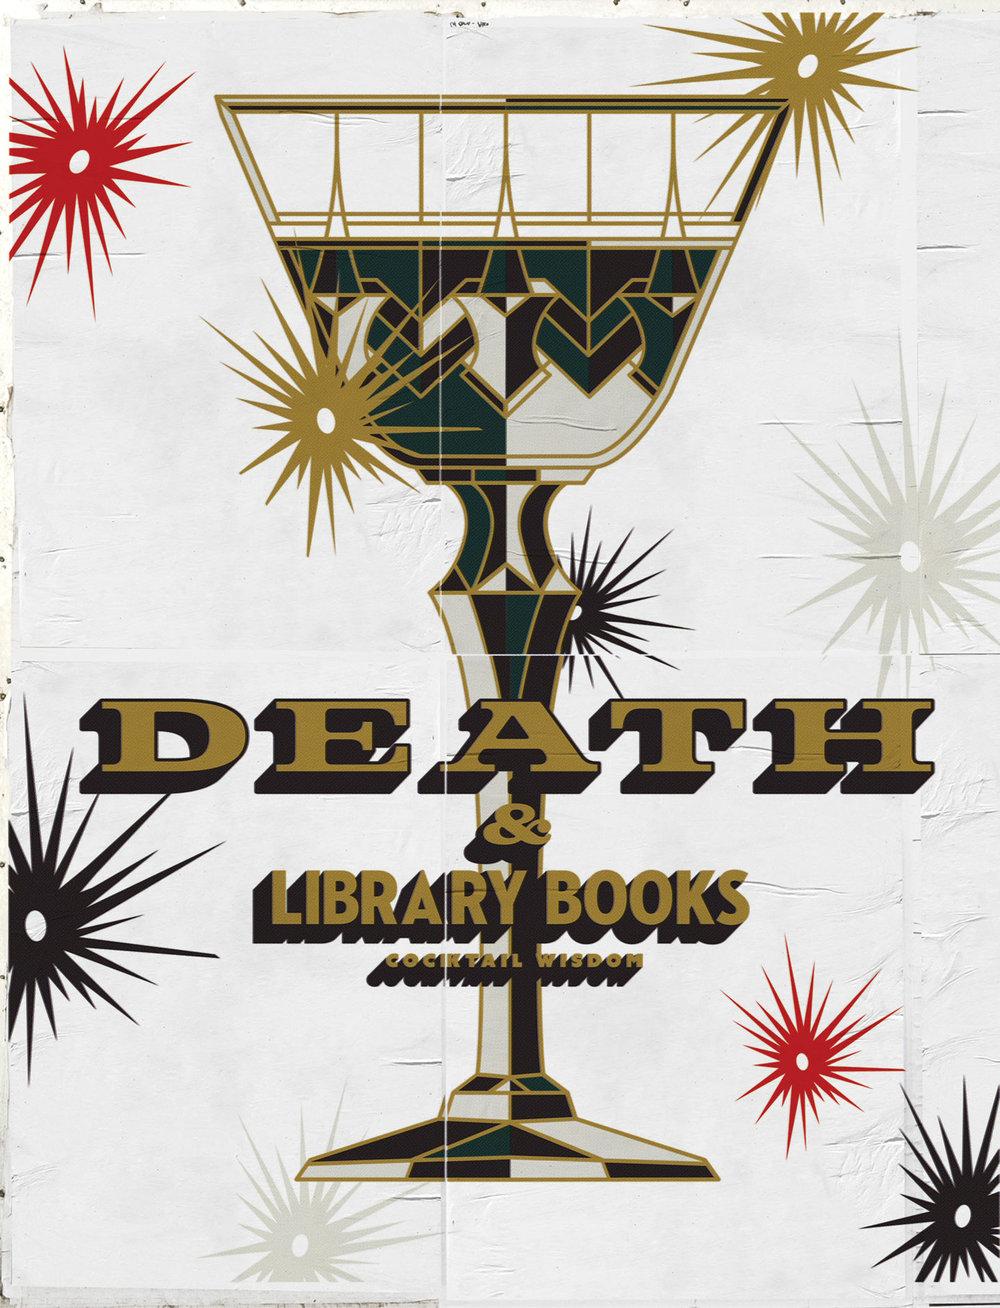 tim_meyer_graphic_design_meijer_death_library_books_cocktail_glass.jpg